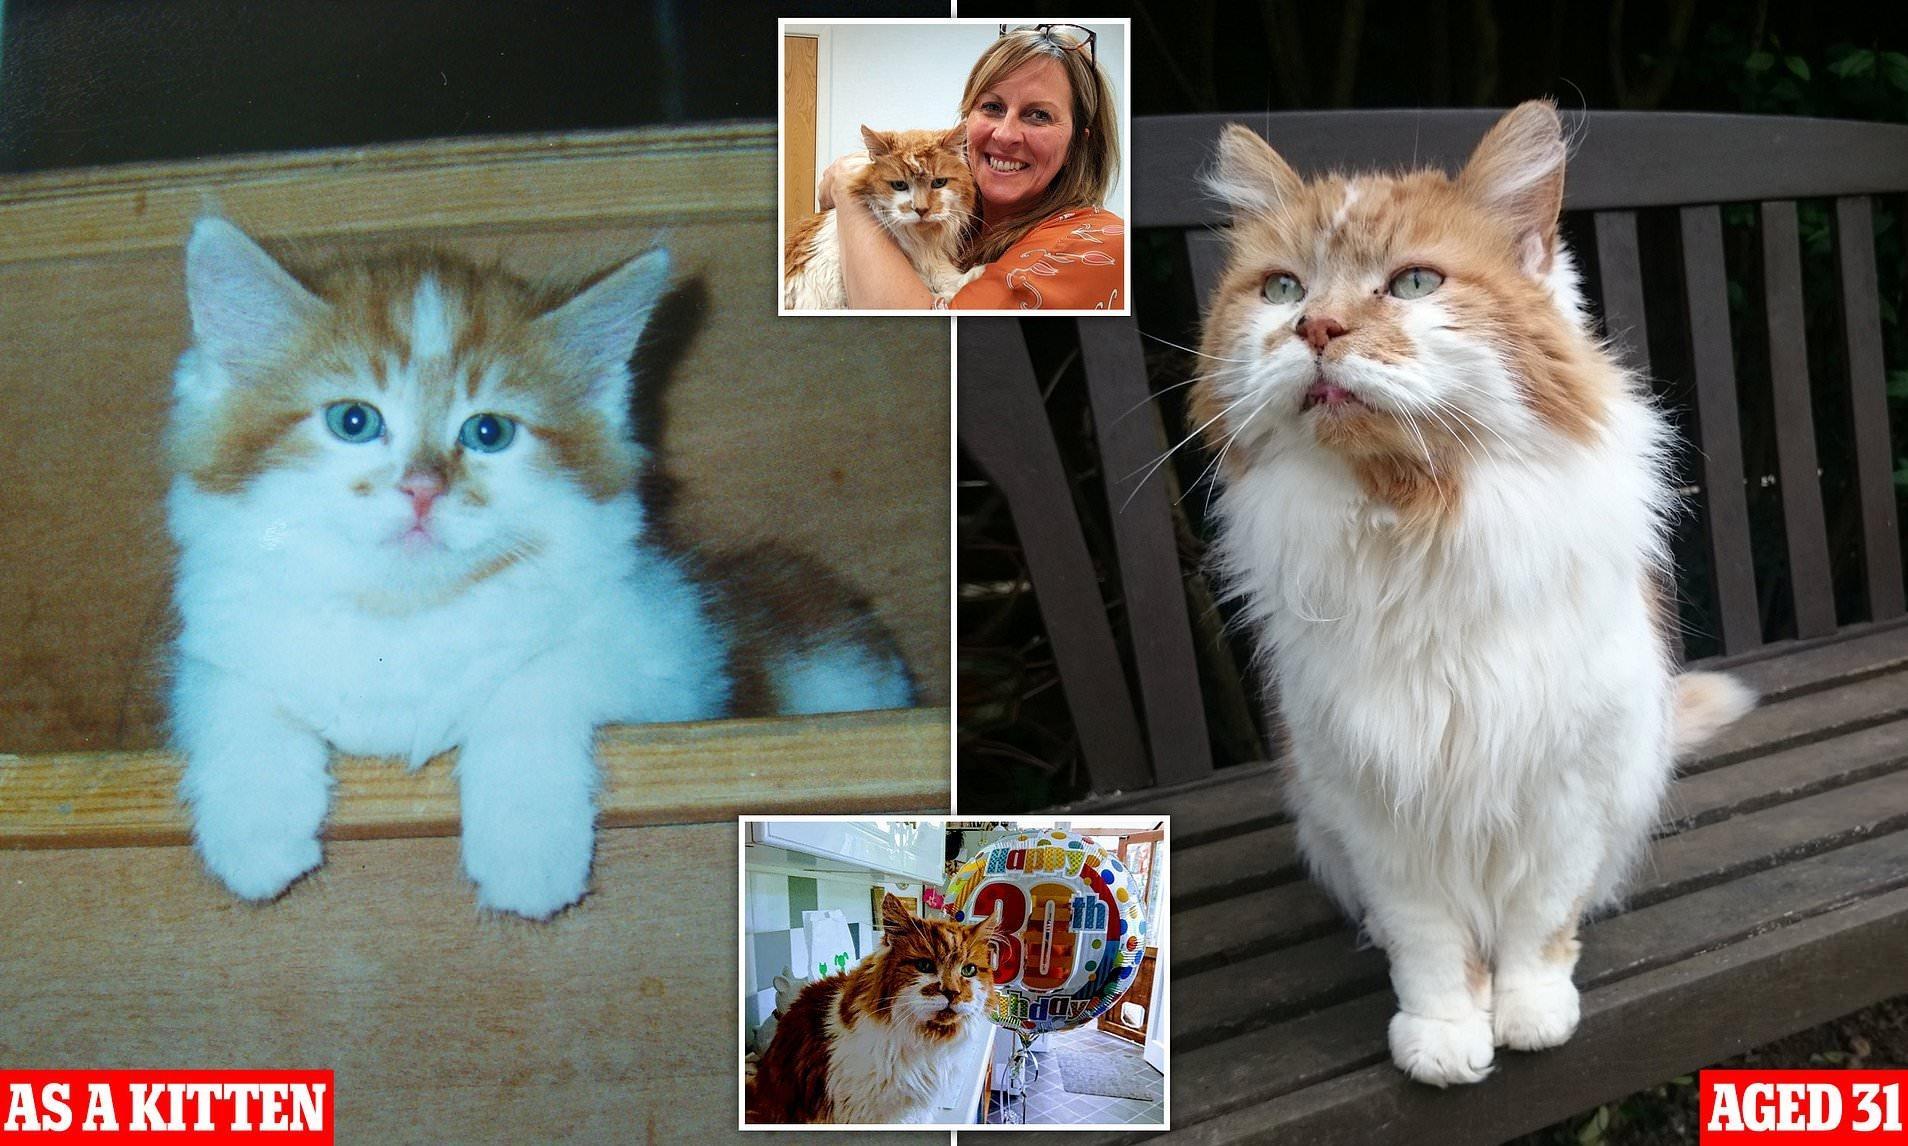 Rubble a legöregebb cica, forrás: dailymail.co.uk